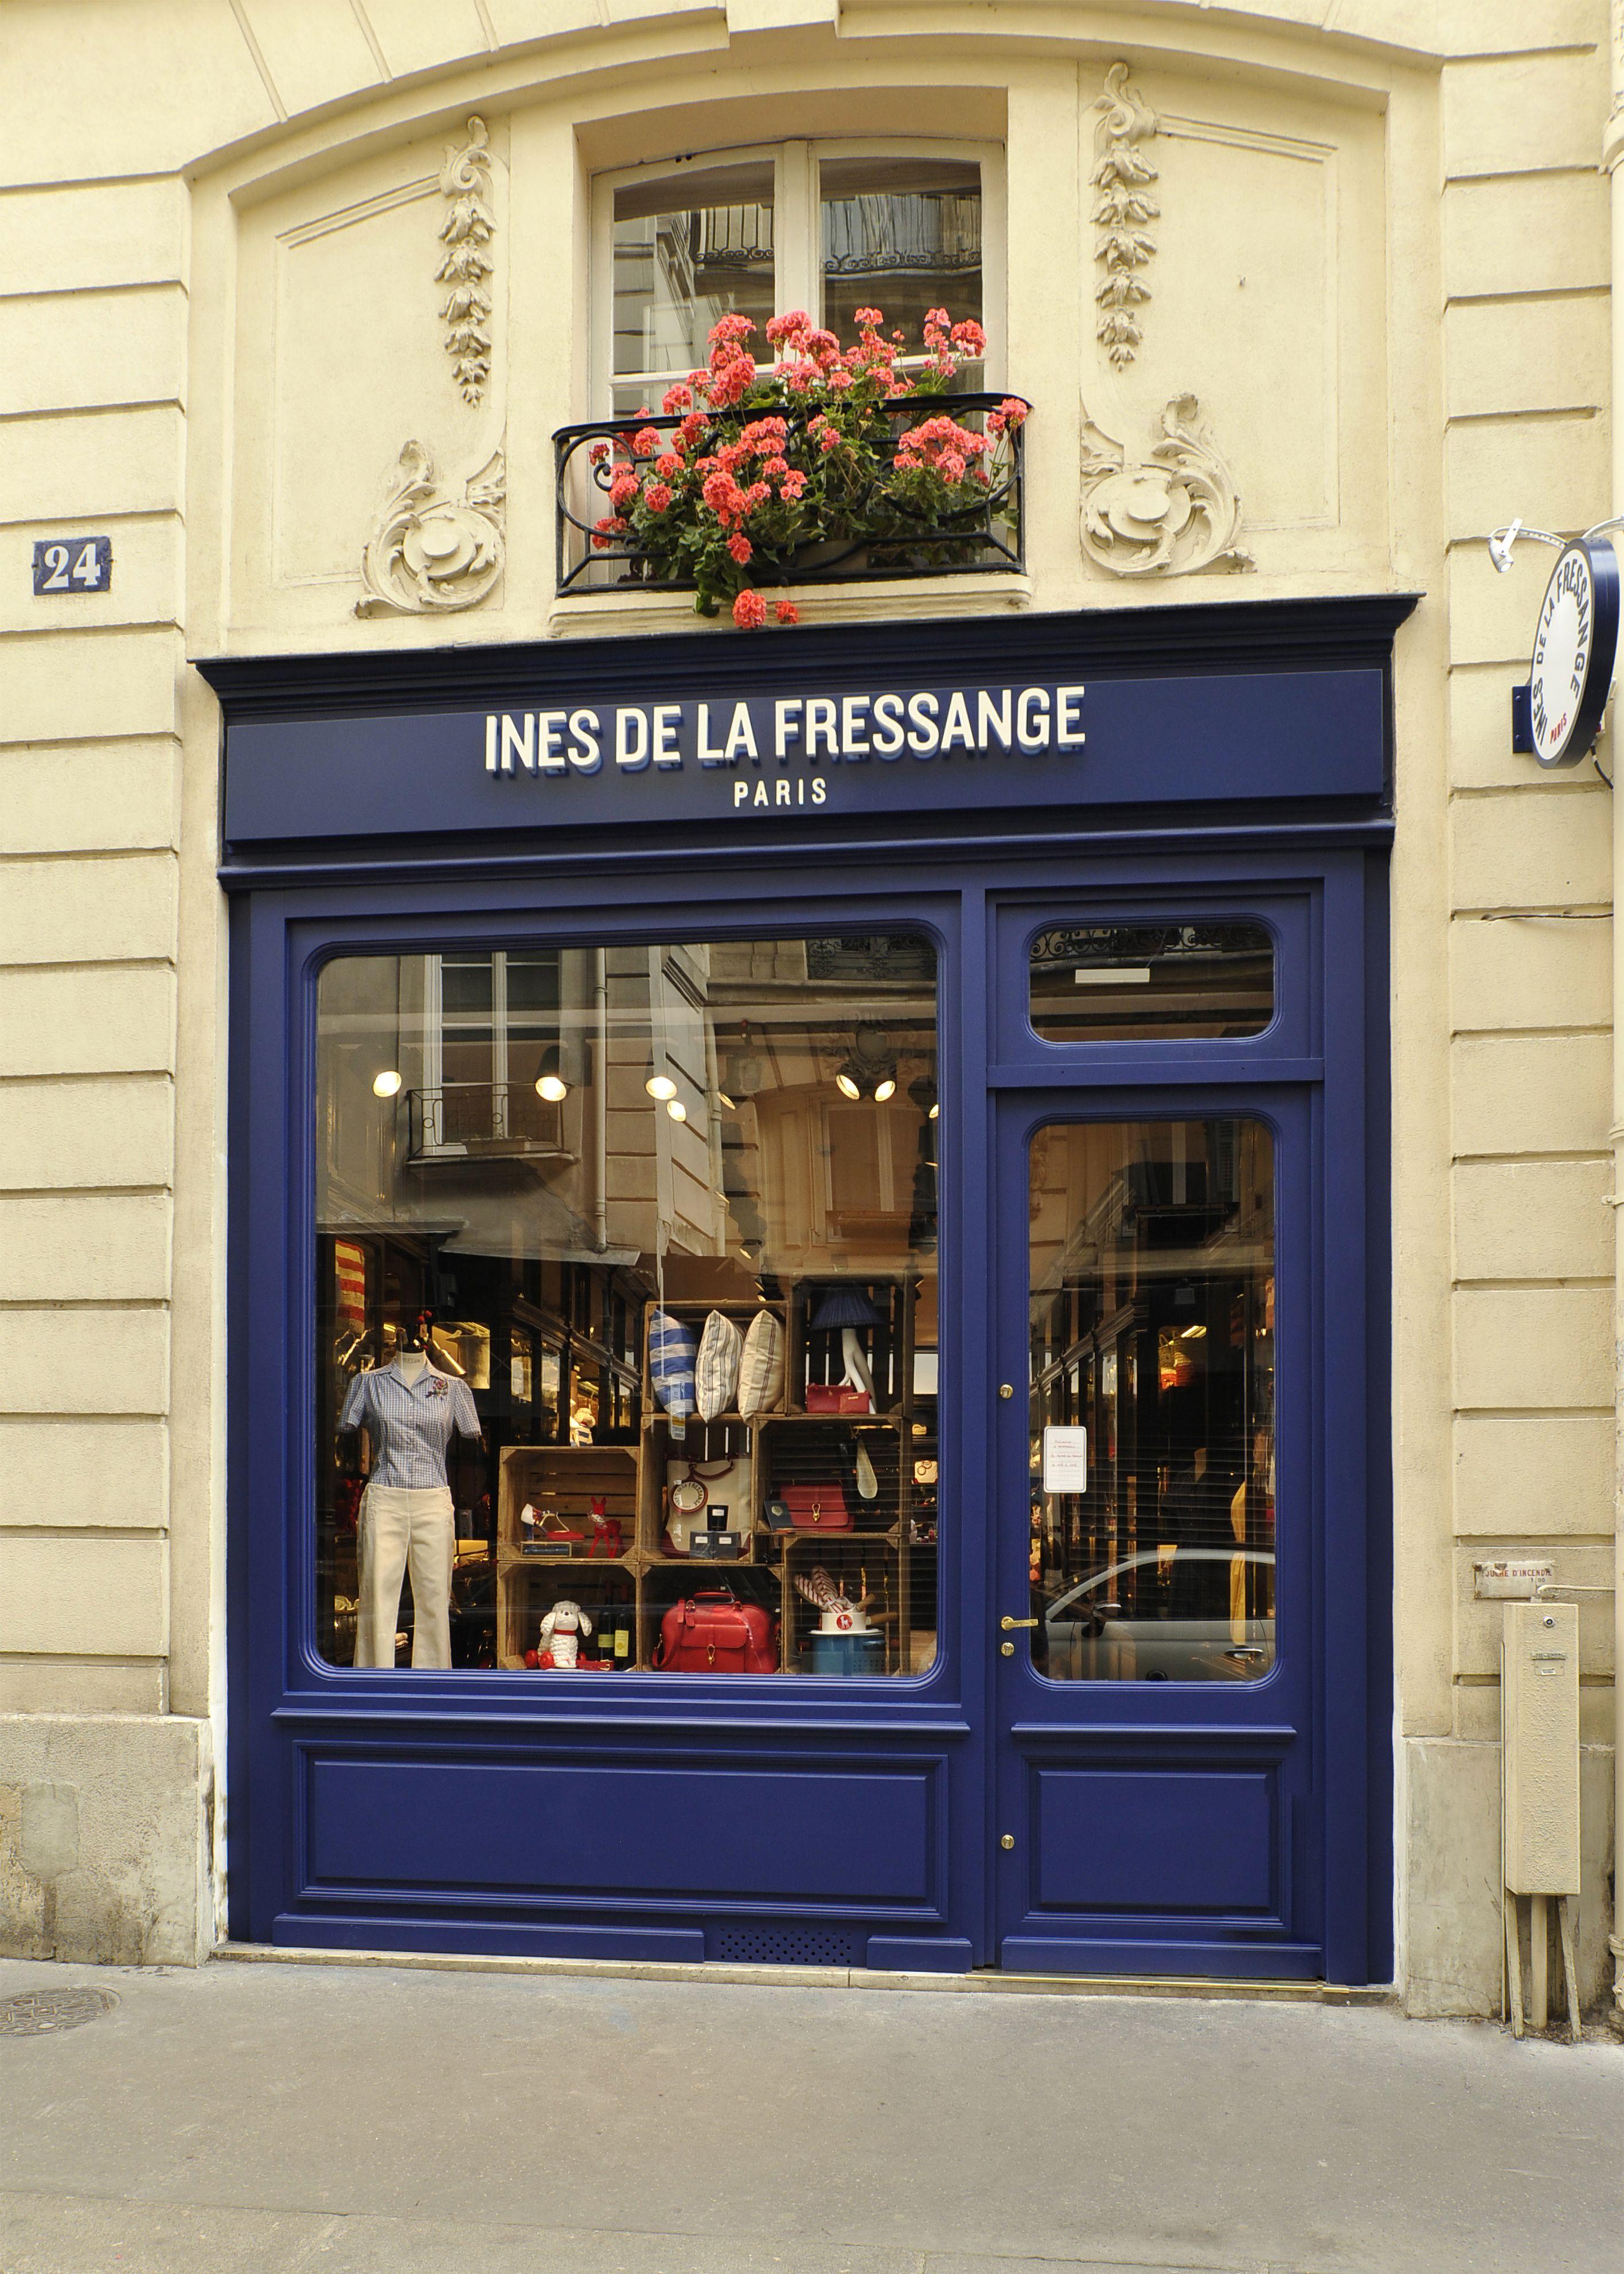 VIDA Statement Bag - Blvd. Saint-Germain by VIDA w67IcQ9Wkw